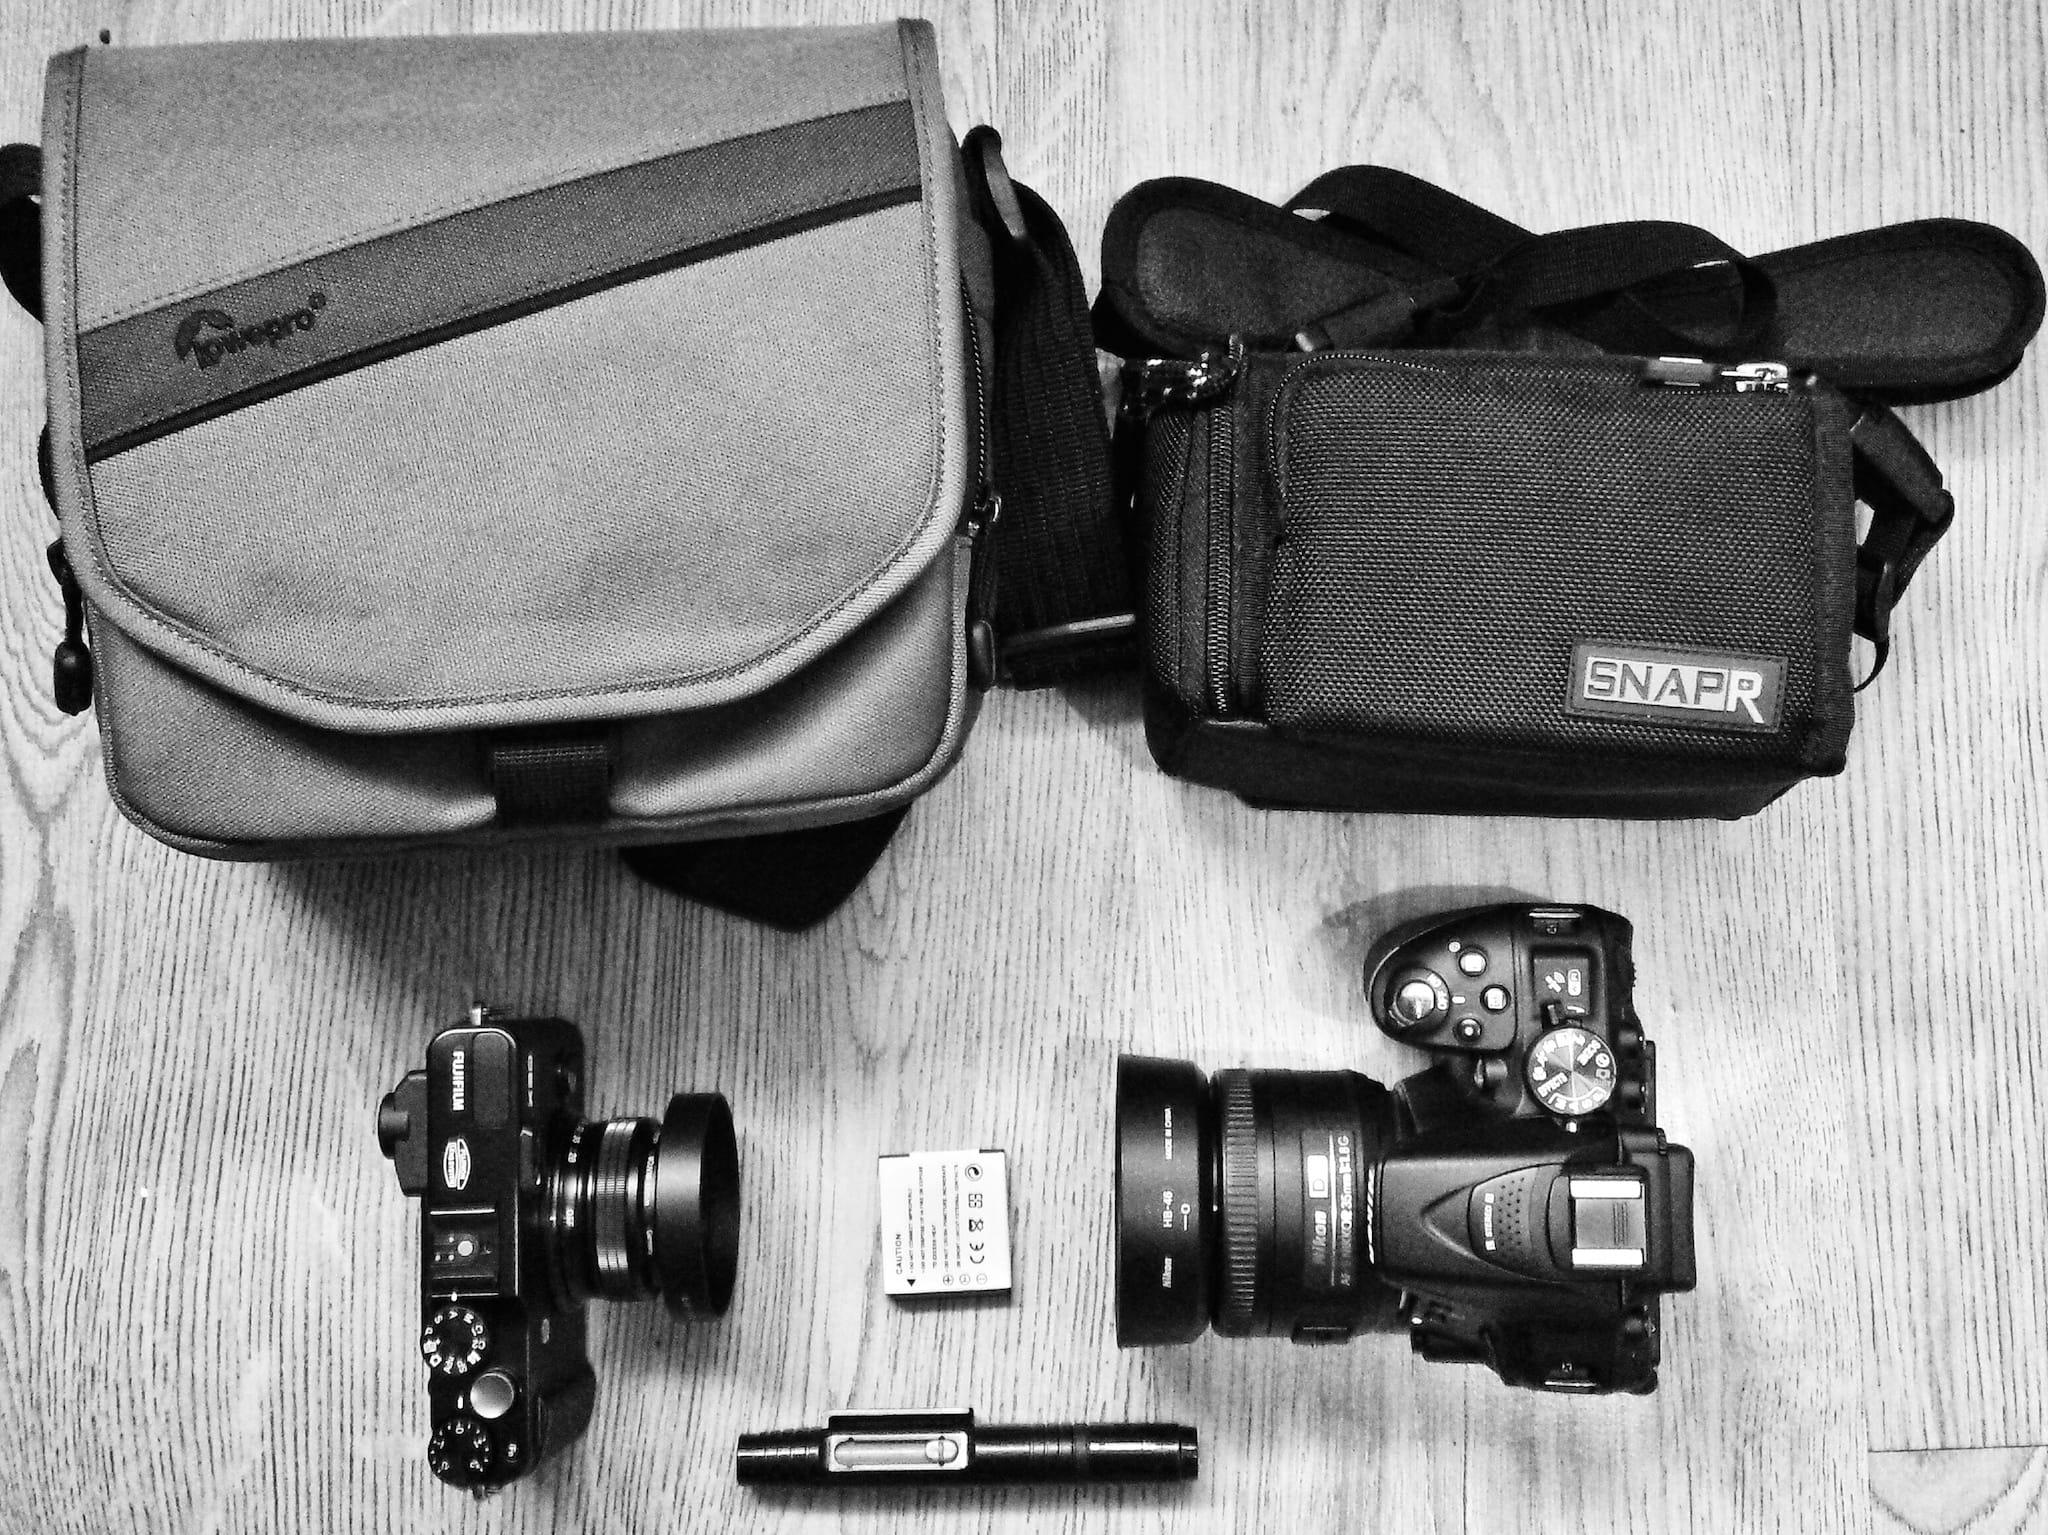 Owen Jenkins Camera Bag